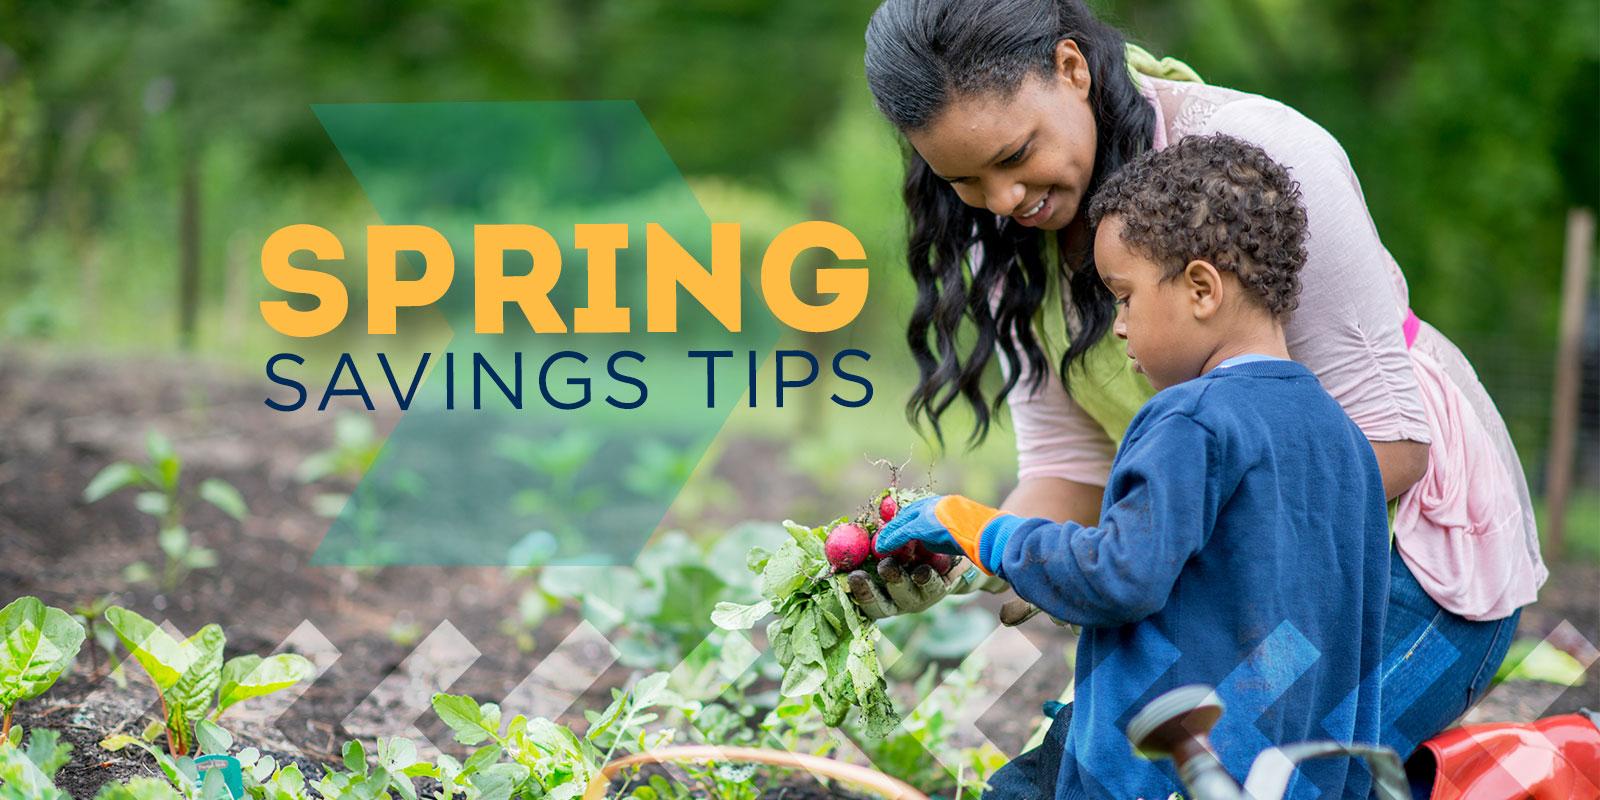 Spring Savings Tips